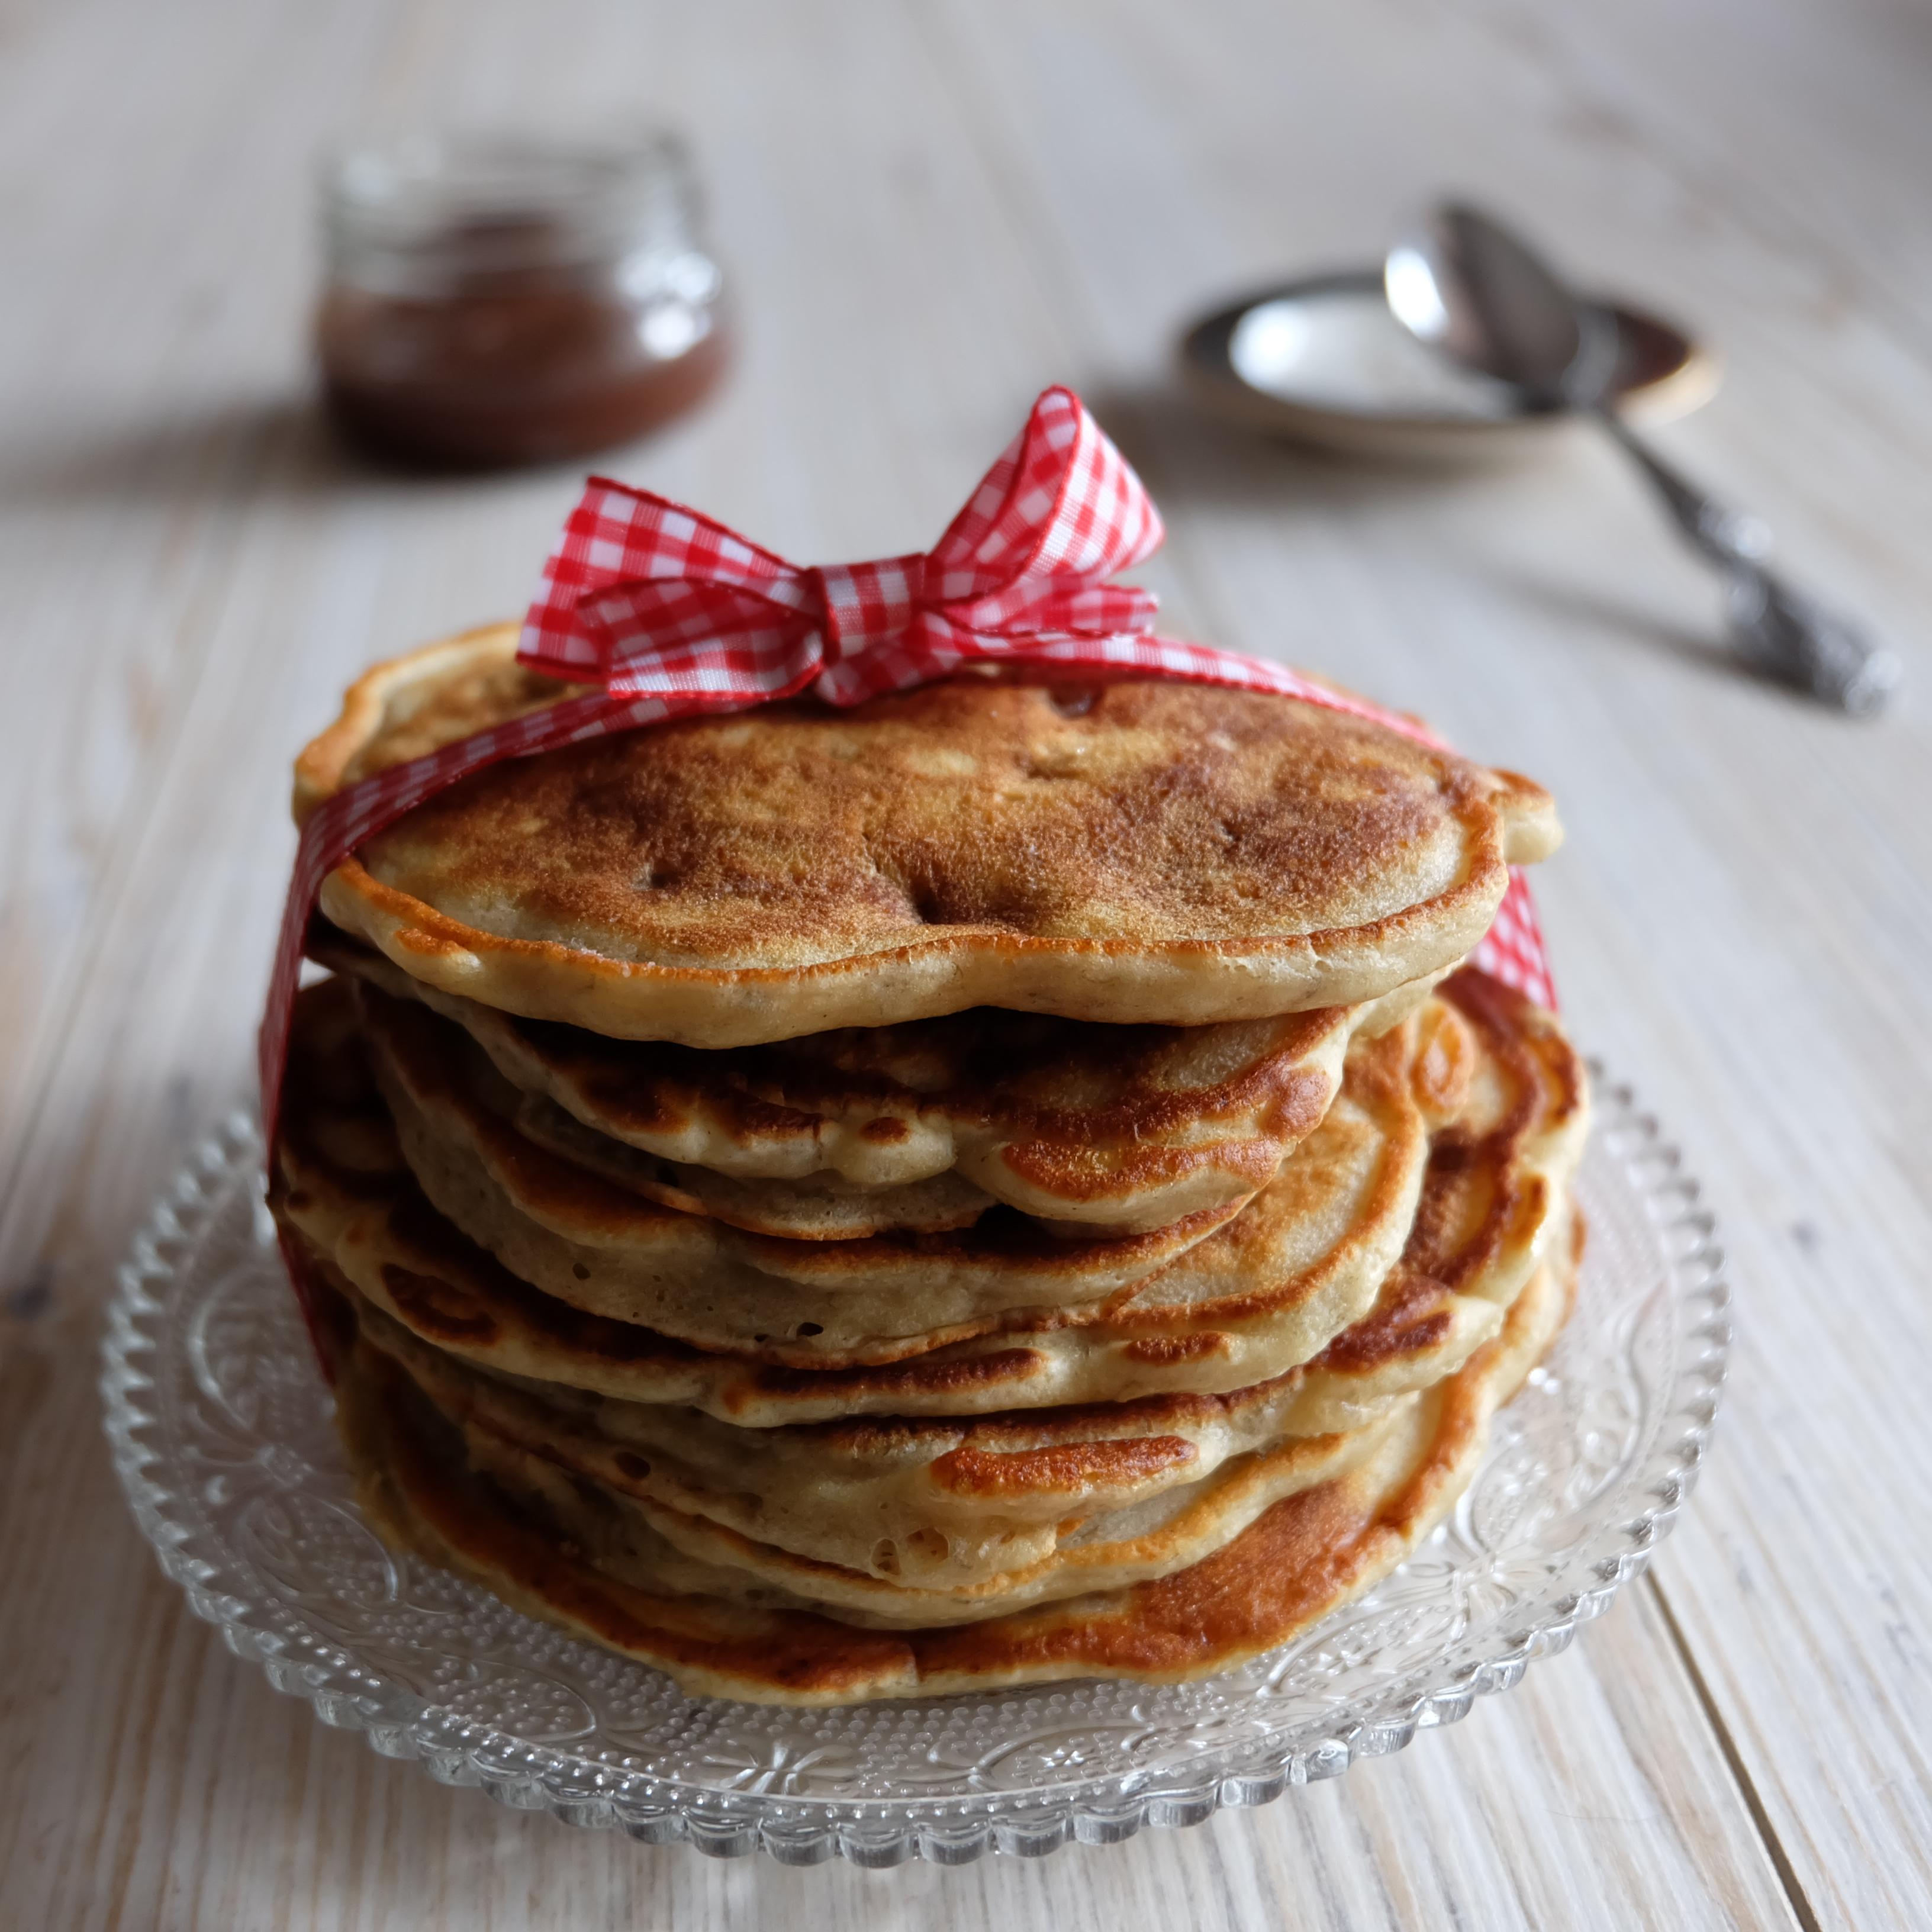 Blog,cuisine,Lyon,recettes,pancakes,banane,healthy,sain,